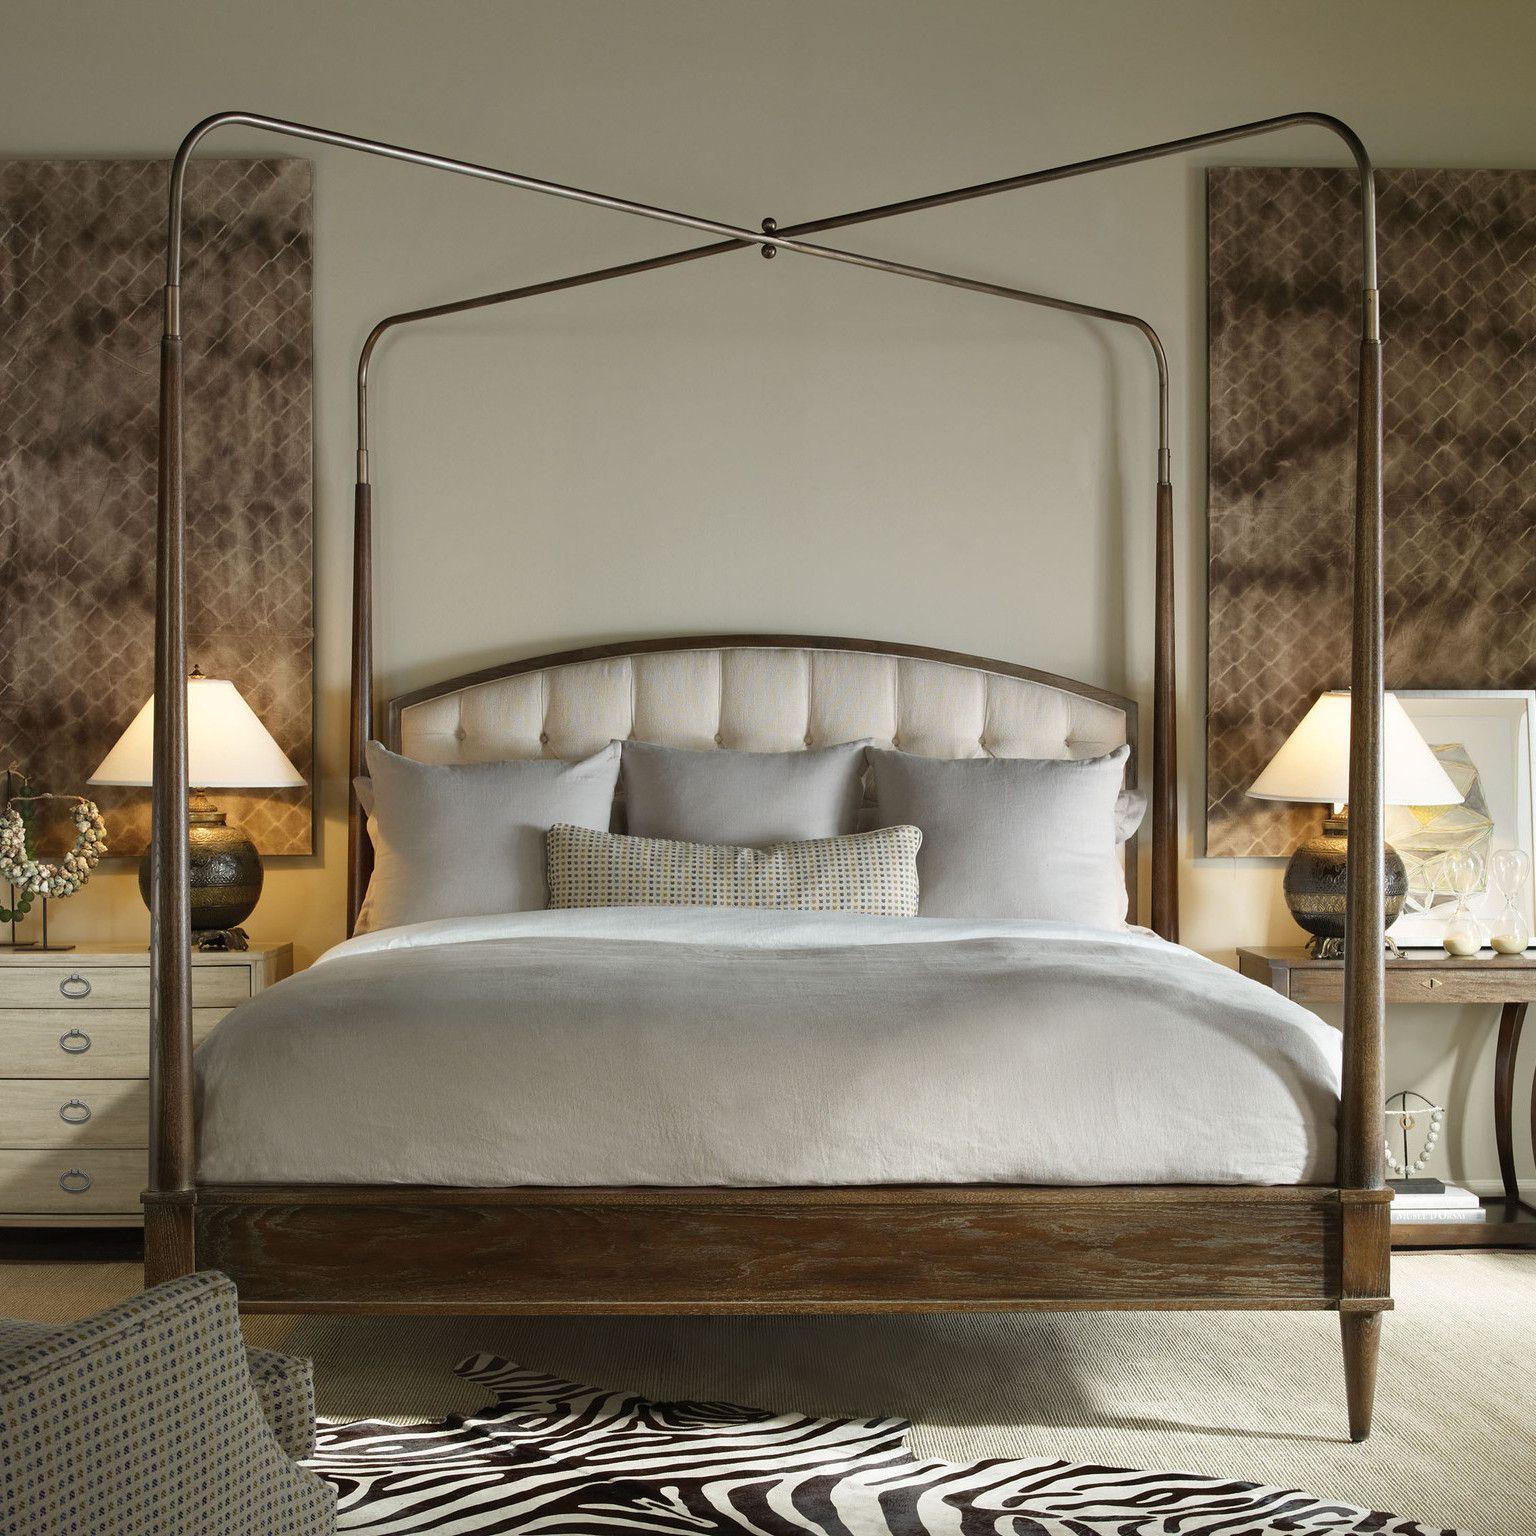 Anderkit Tufted Headboard Bed | Pinterest | Decoracion dormitorios ...